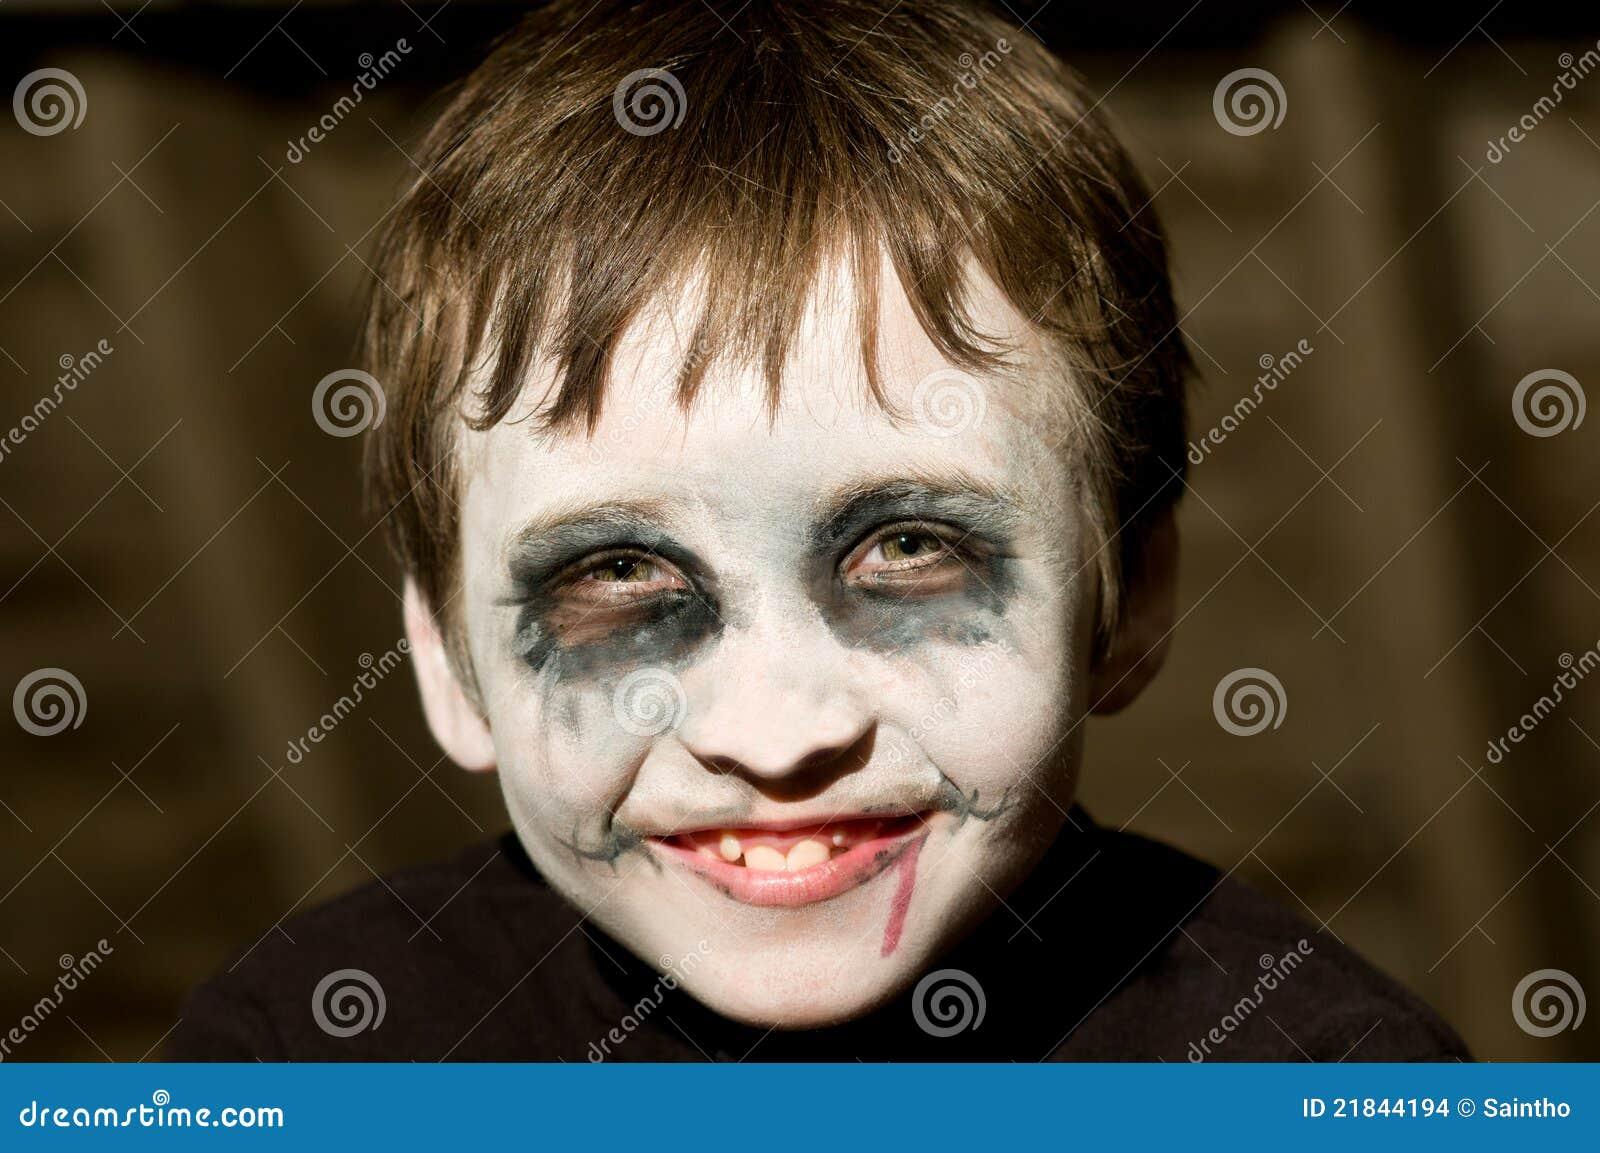 Young Boy With Halloween Makeup Stock Images  Image: 21844194 - Boys Halloween Makeup